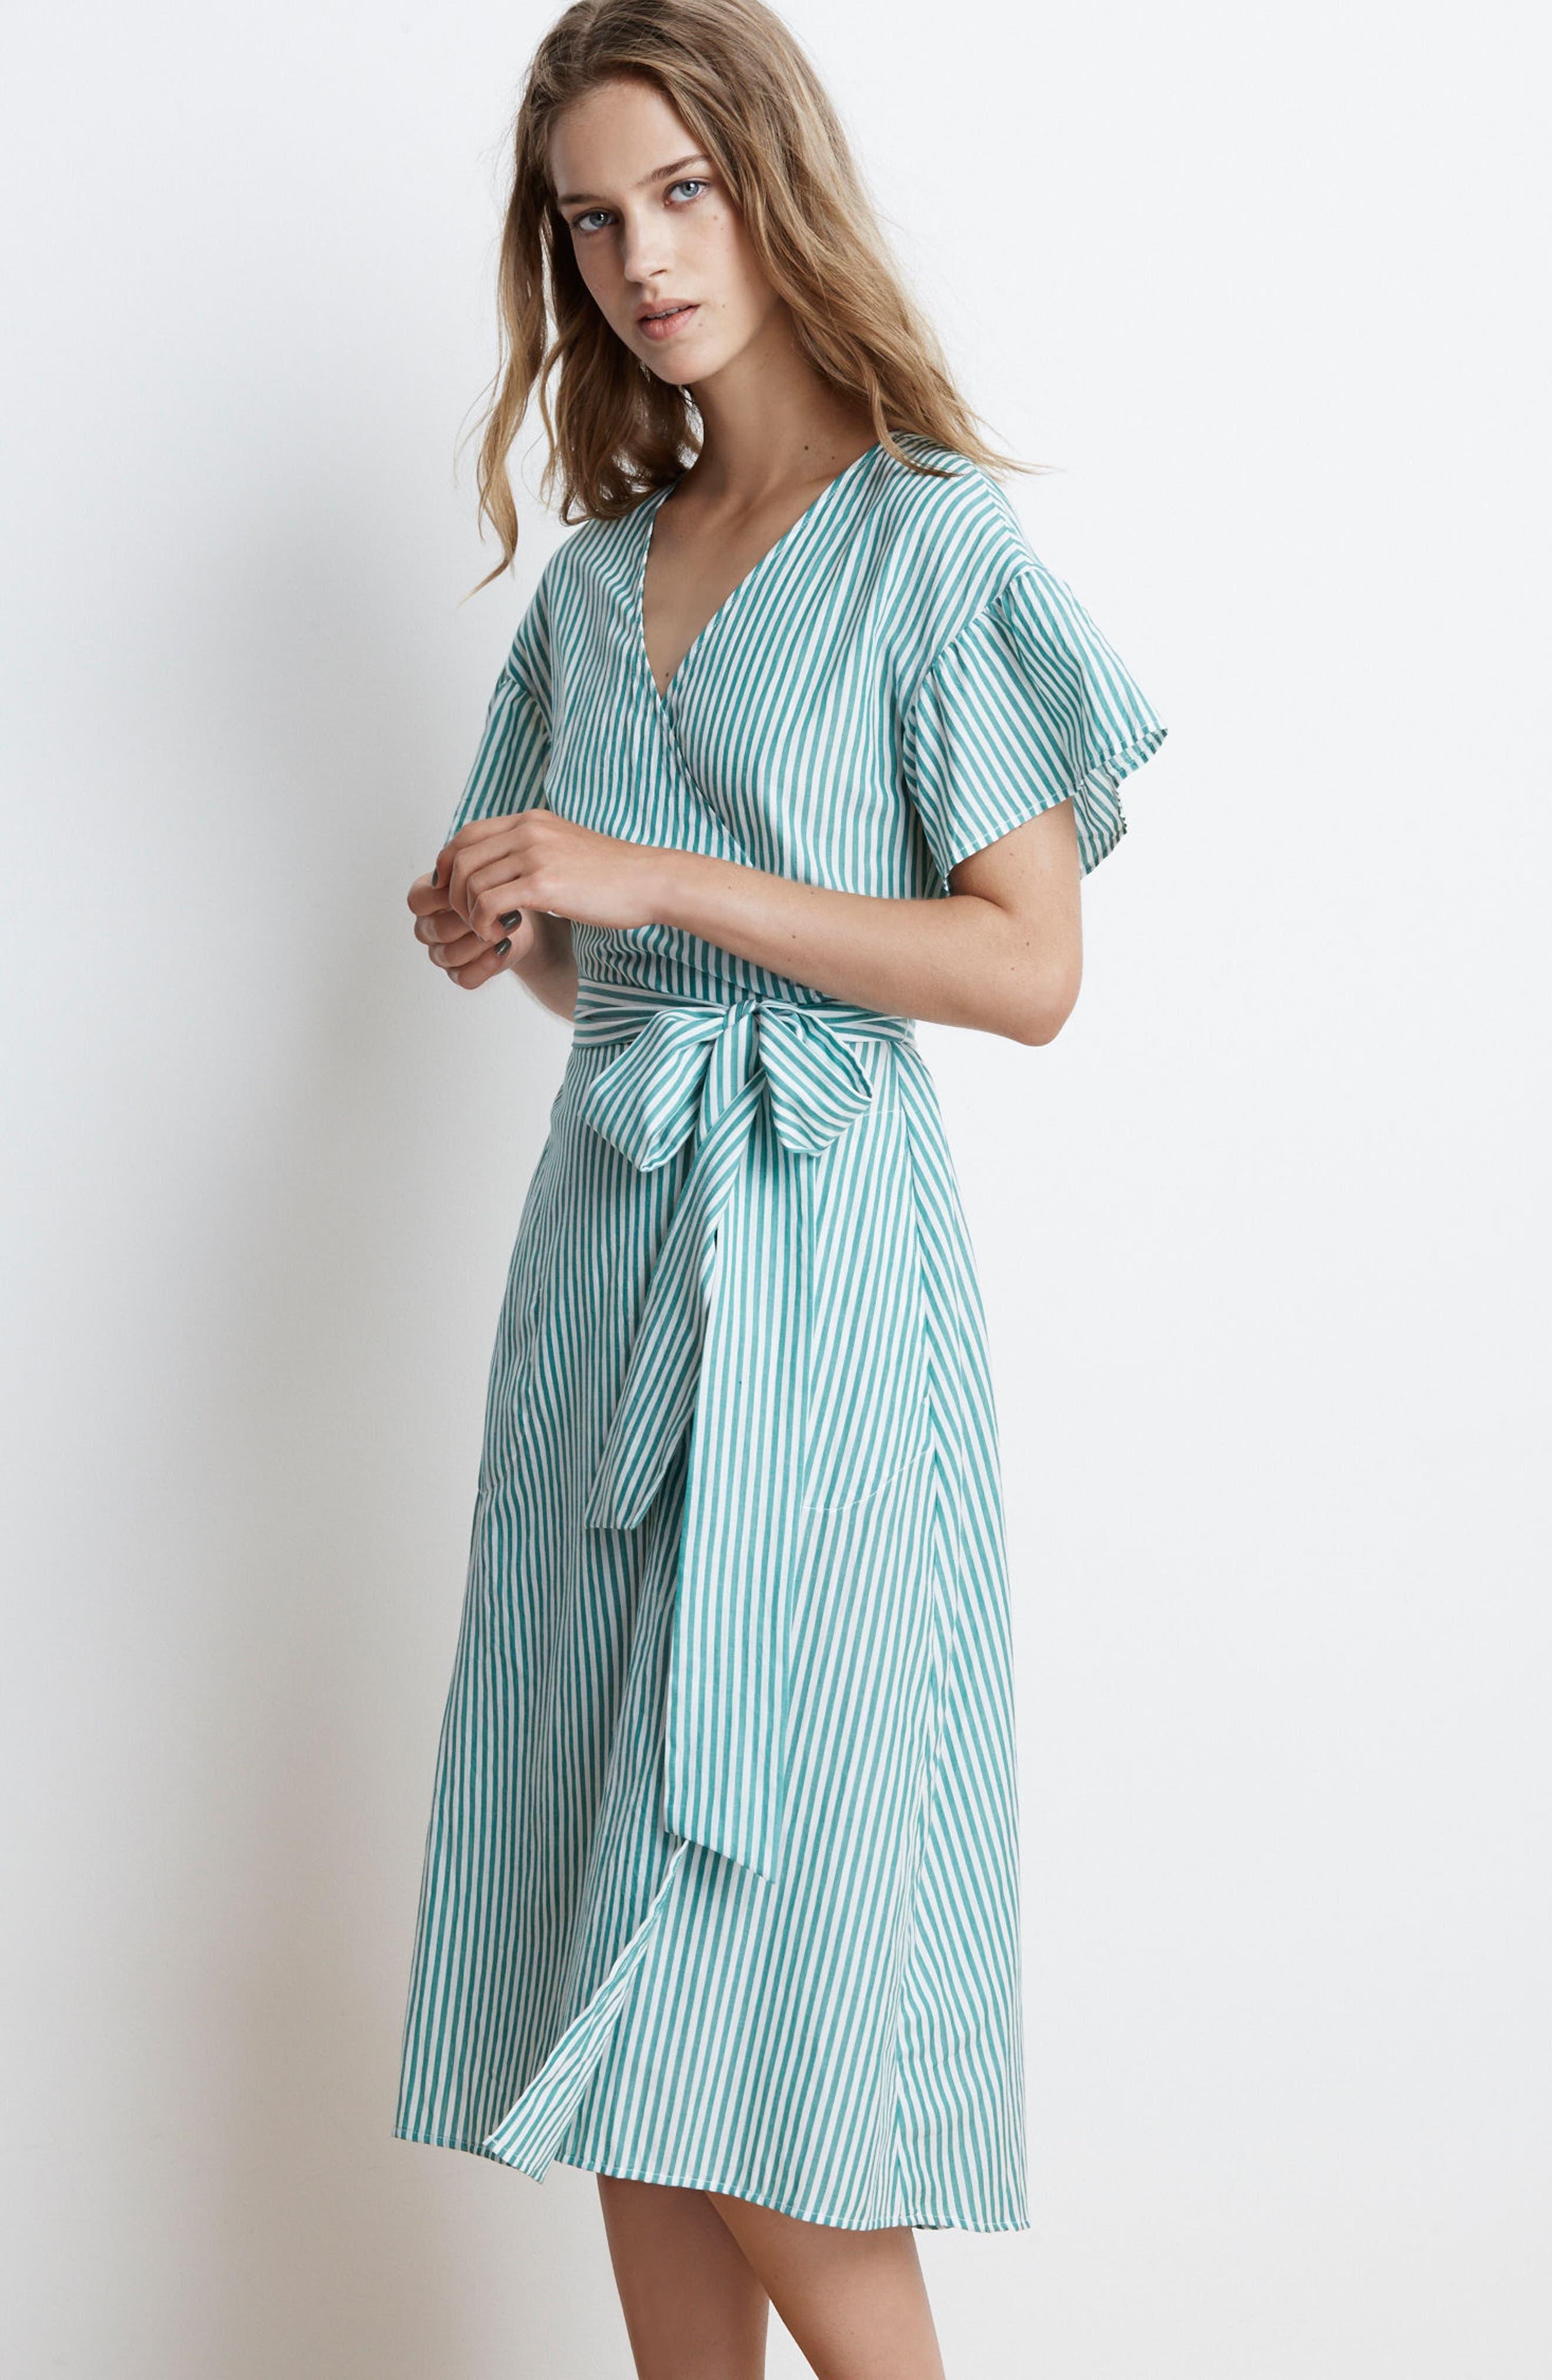 Stripe Cotton Wrap Dress,                             Alternate thumbnail 8, color,                             389